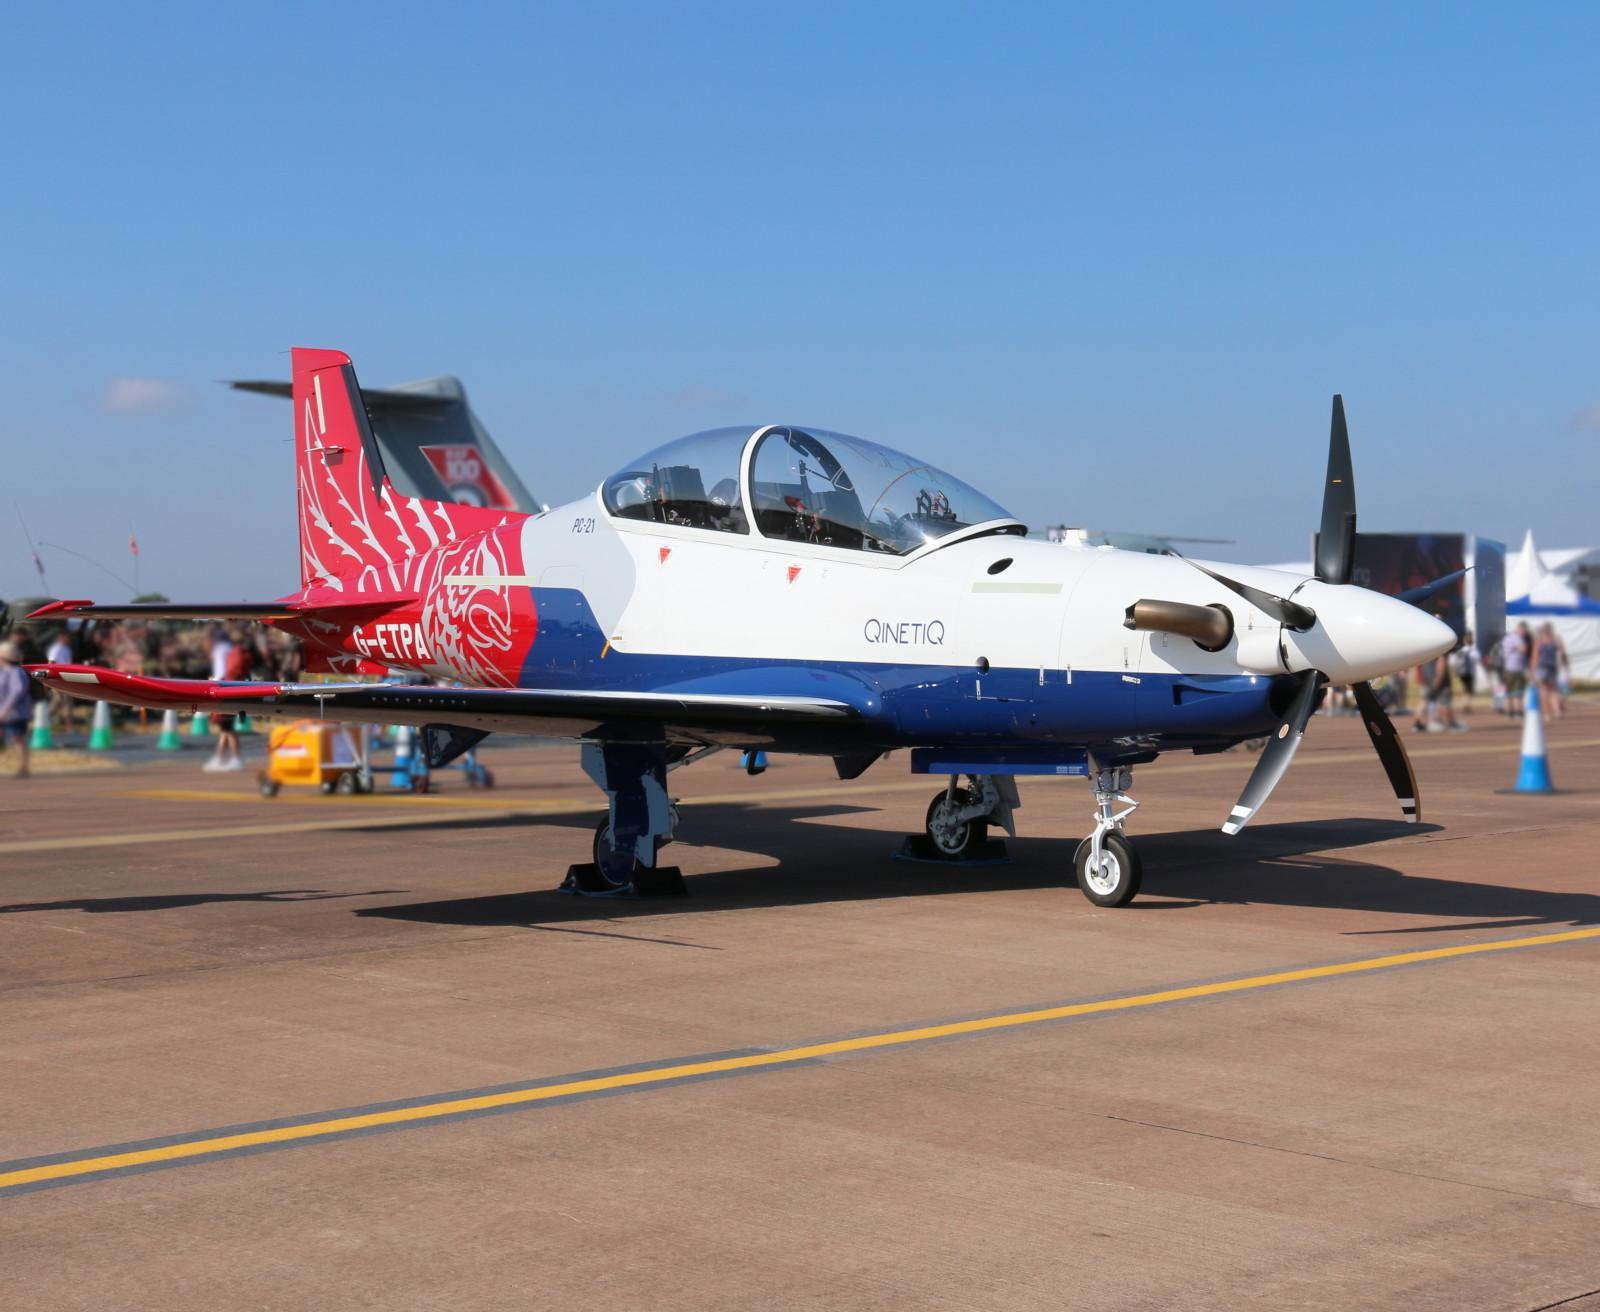 Pilatus PC-21 G-ETPA der Firma QinetiQ © Doppeladler.com